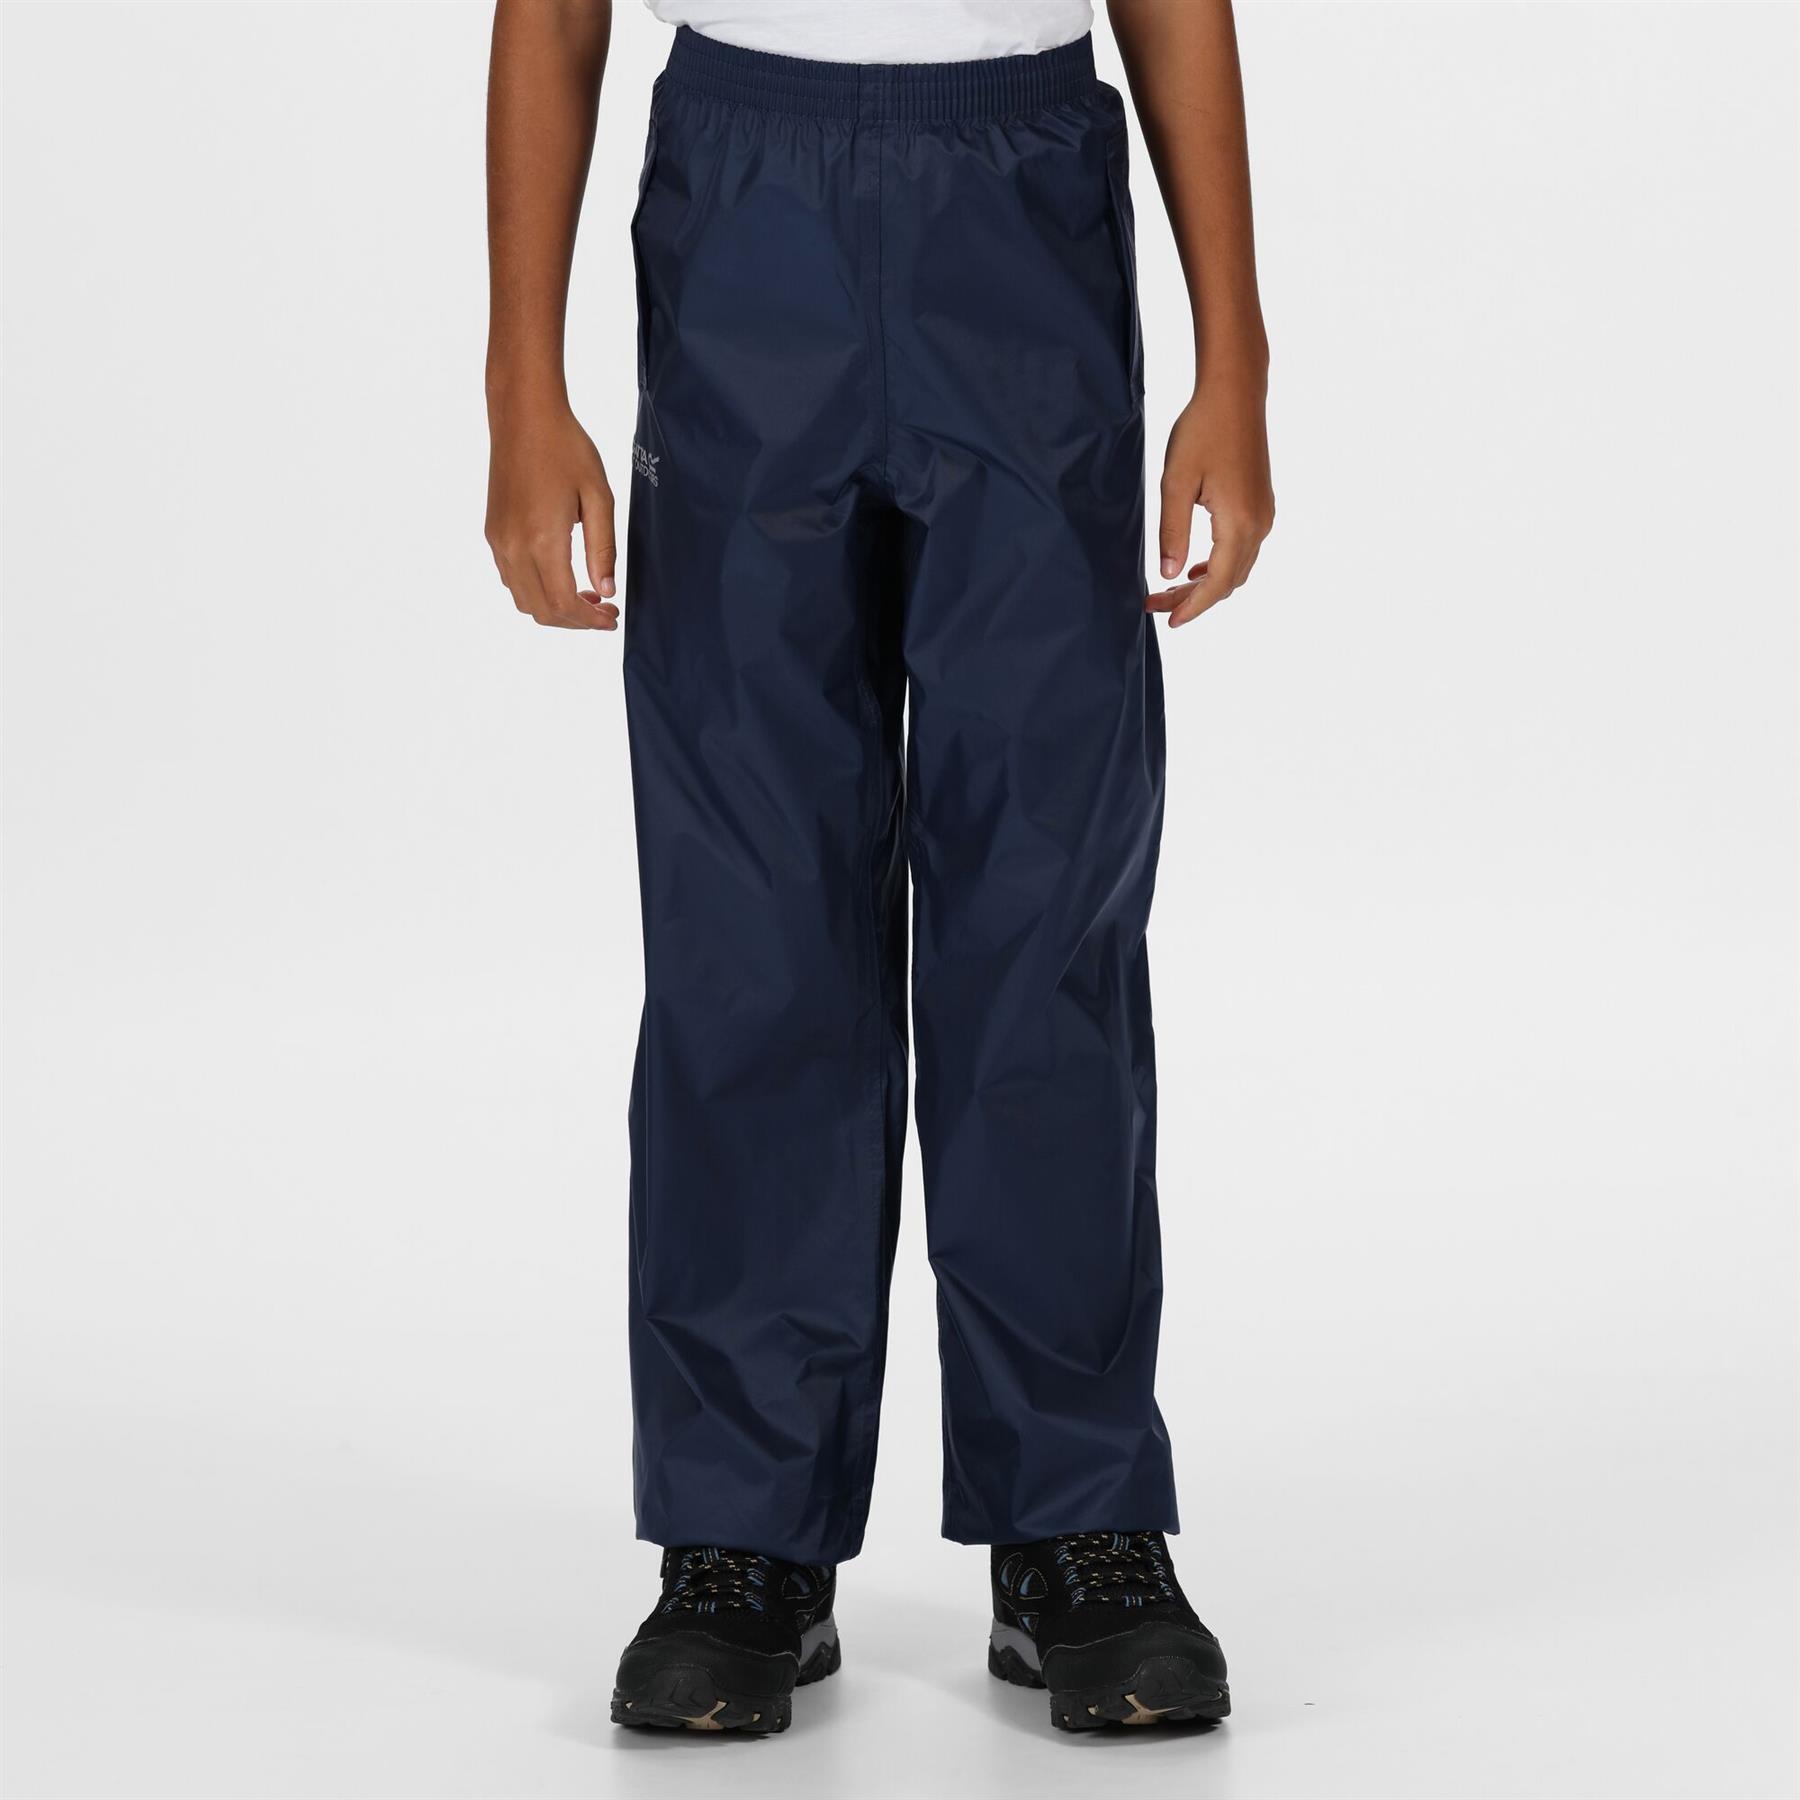 miniatuur 8 - Regatta Kids Pack It Waterproof Packable Overtrousers Boys Girls Trousers